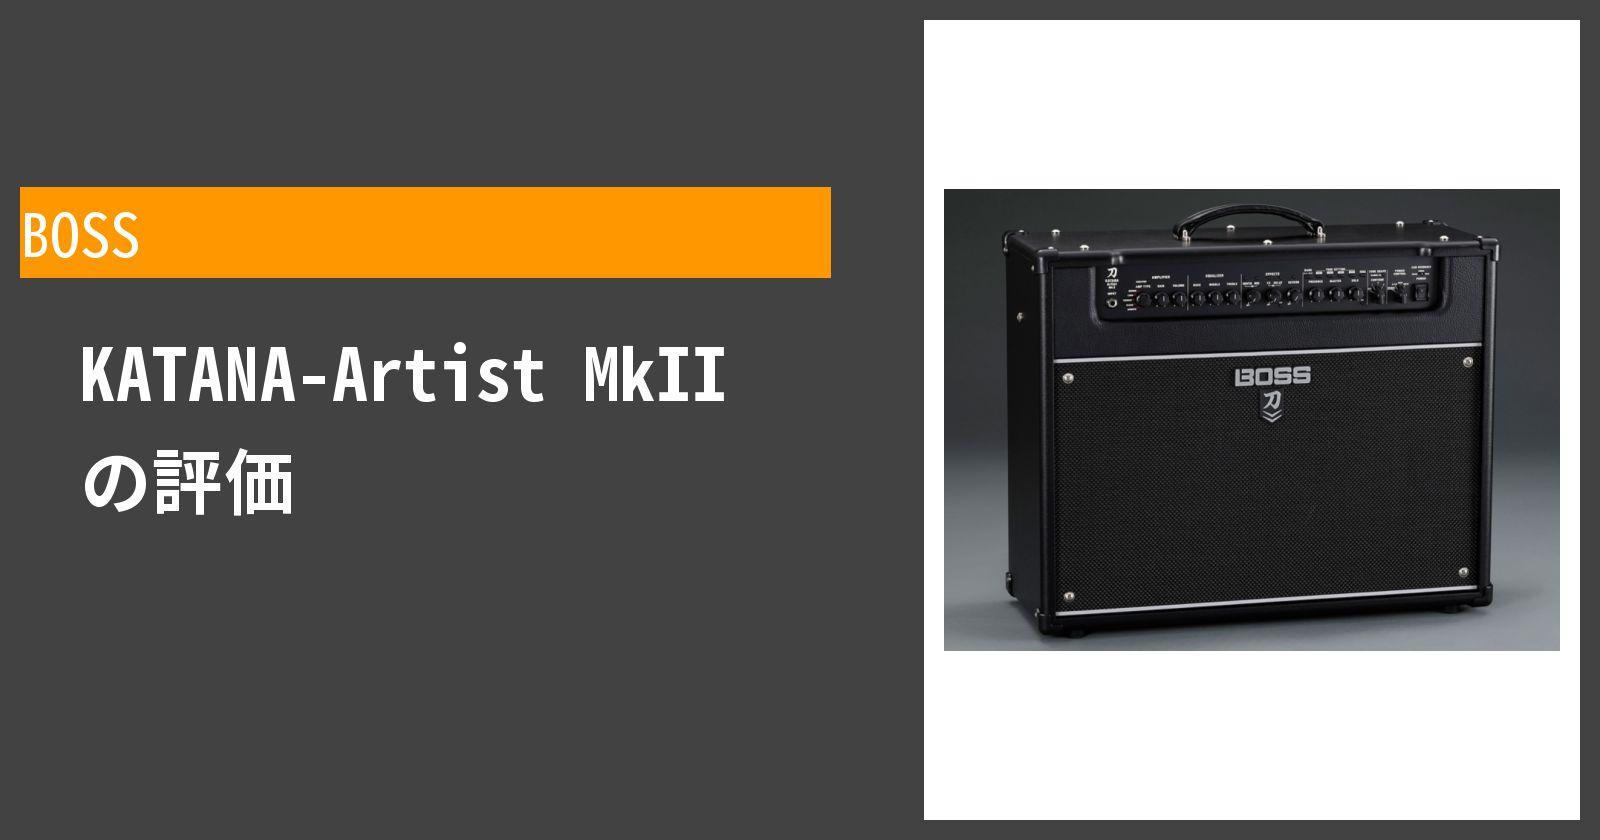 KATANA-Artist MkIIを徹底評価